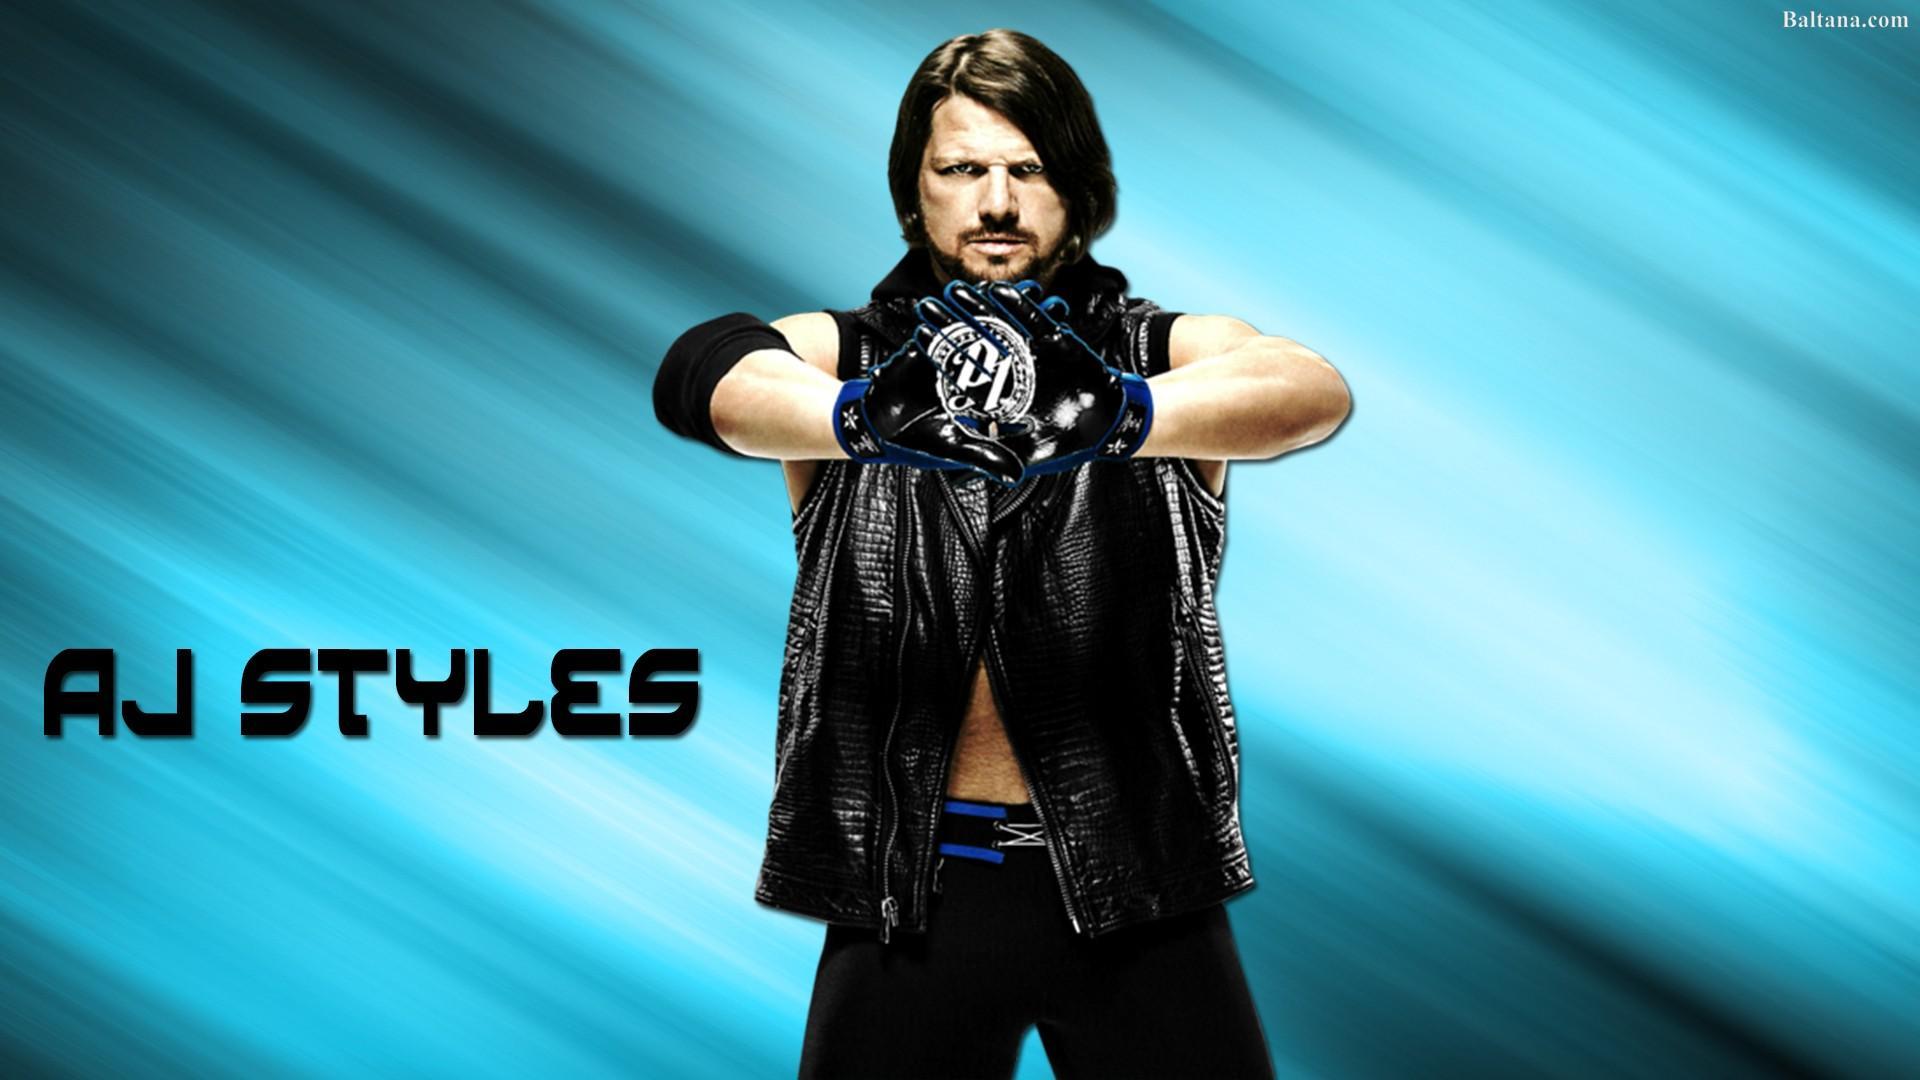 WWE AJ Styles HD Wallpapers - Wallpaper Cave